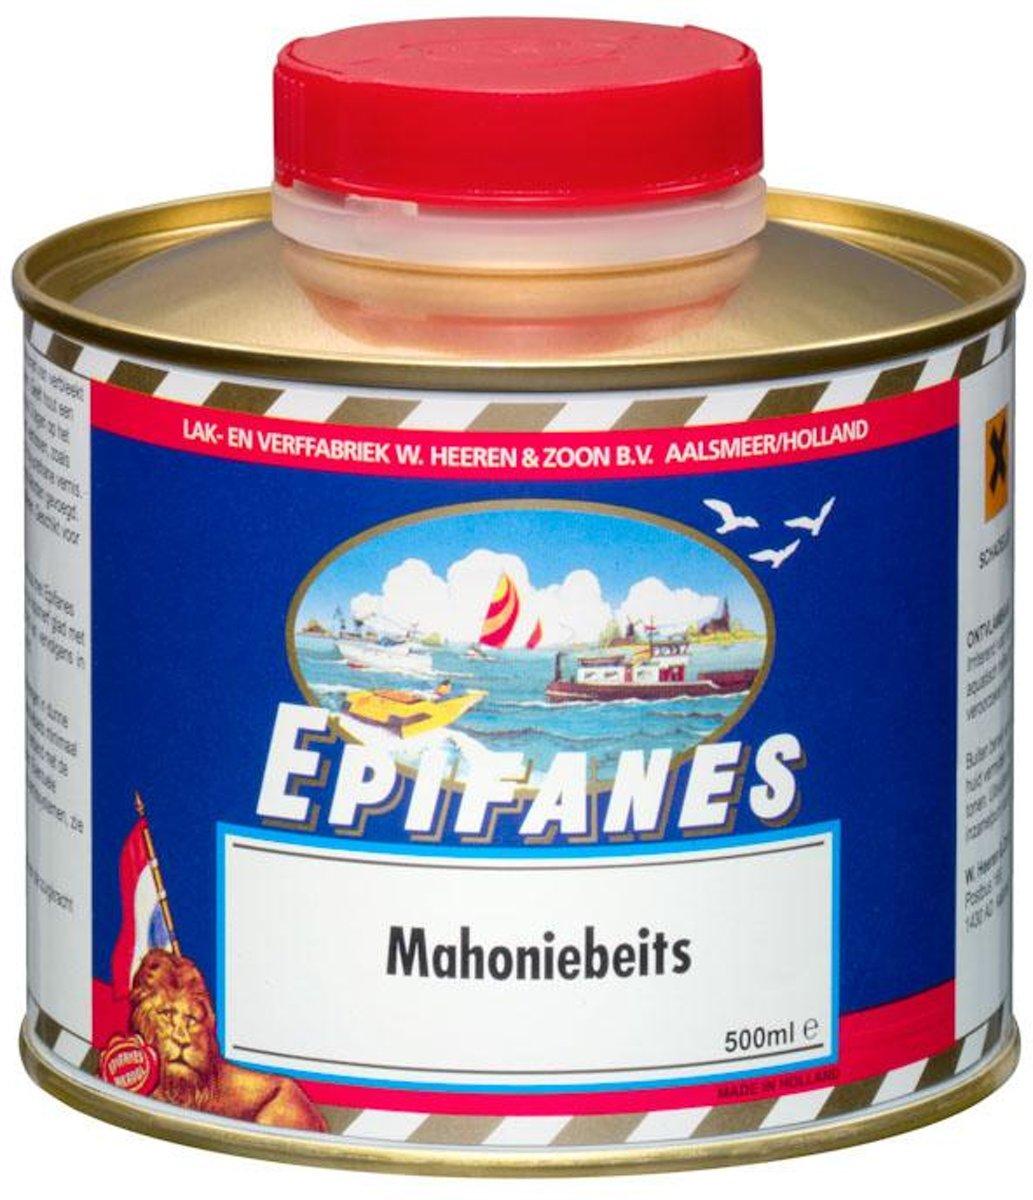 Epifanes Mahoniebeits Epifanes Mahoniebeits